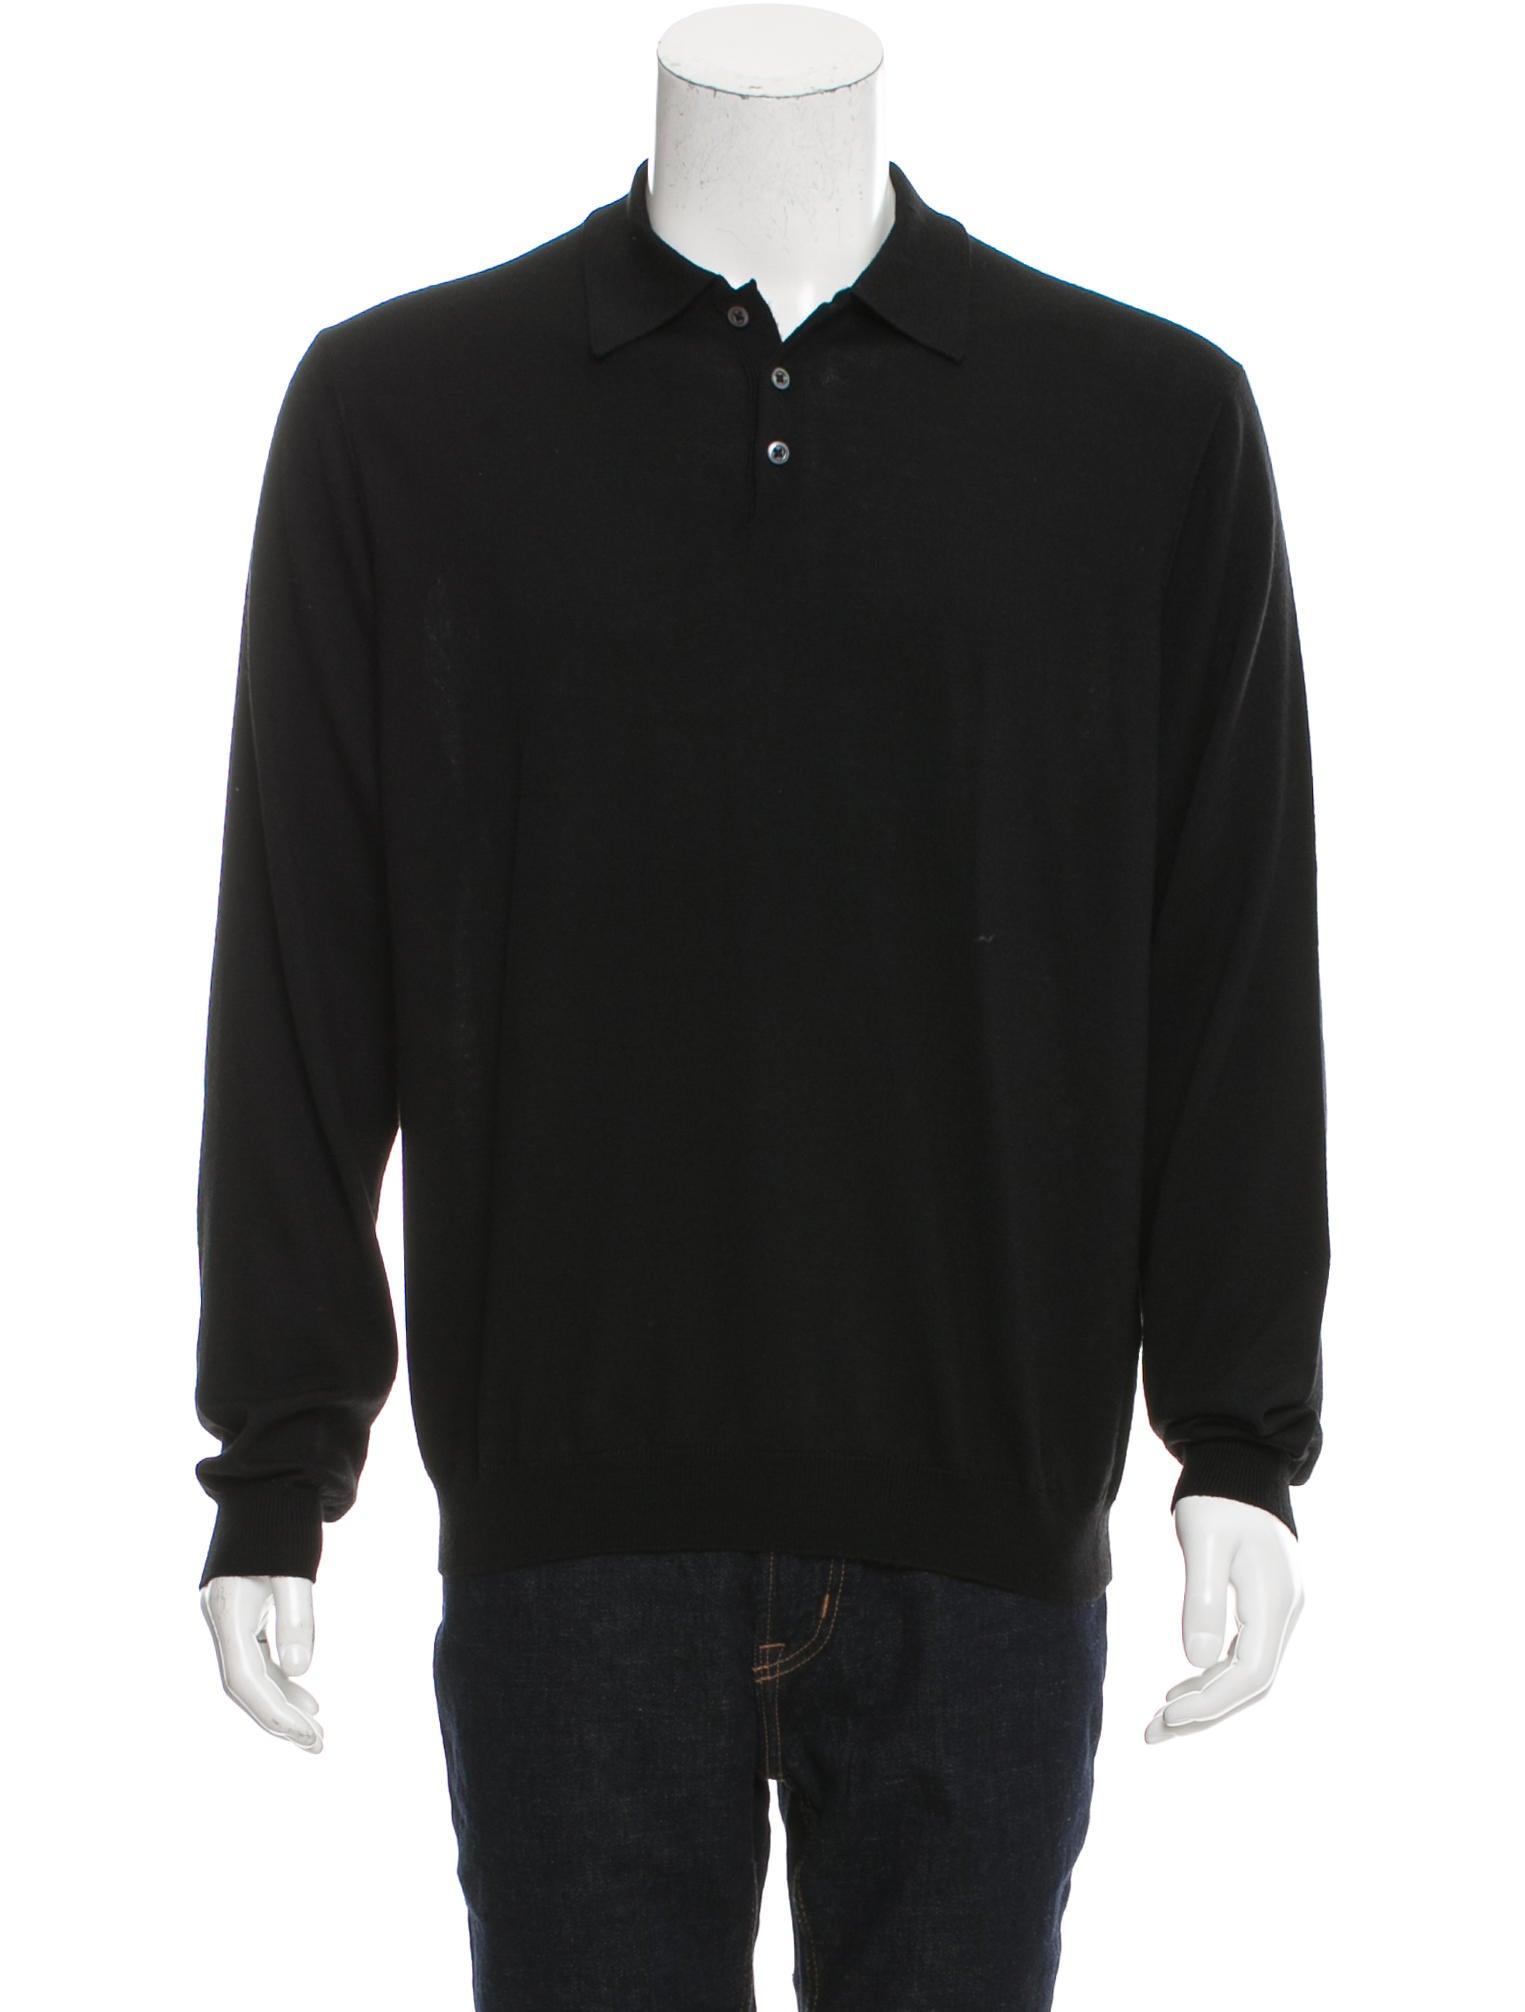 Ralph lauren purple label wool polo sweater clothing for Ralph lauren black label polo shirt